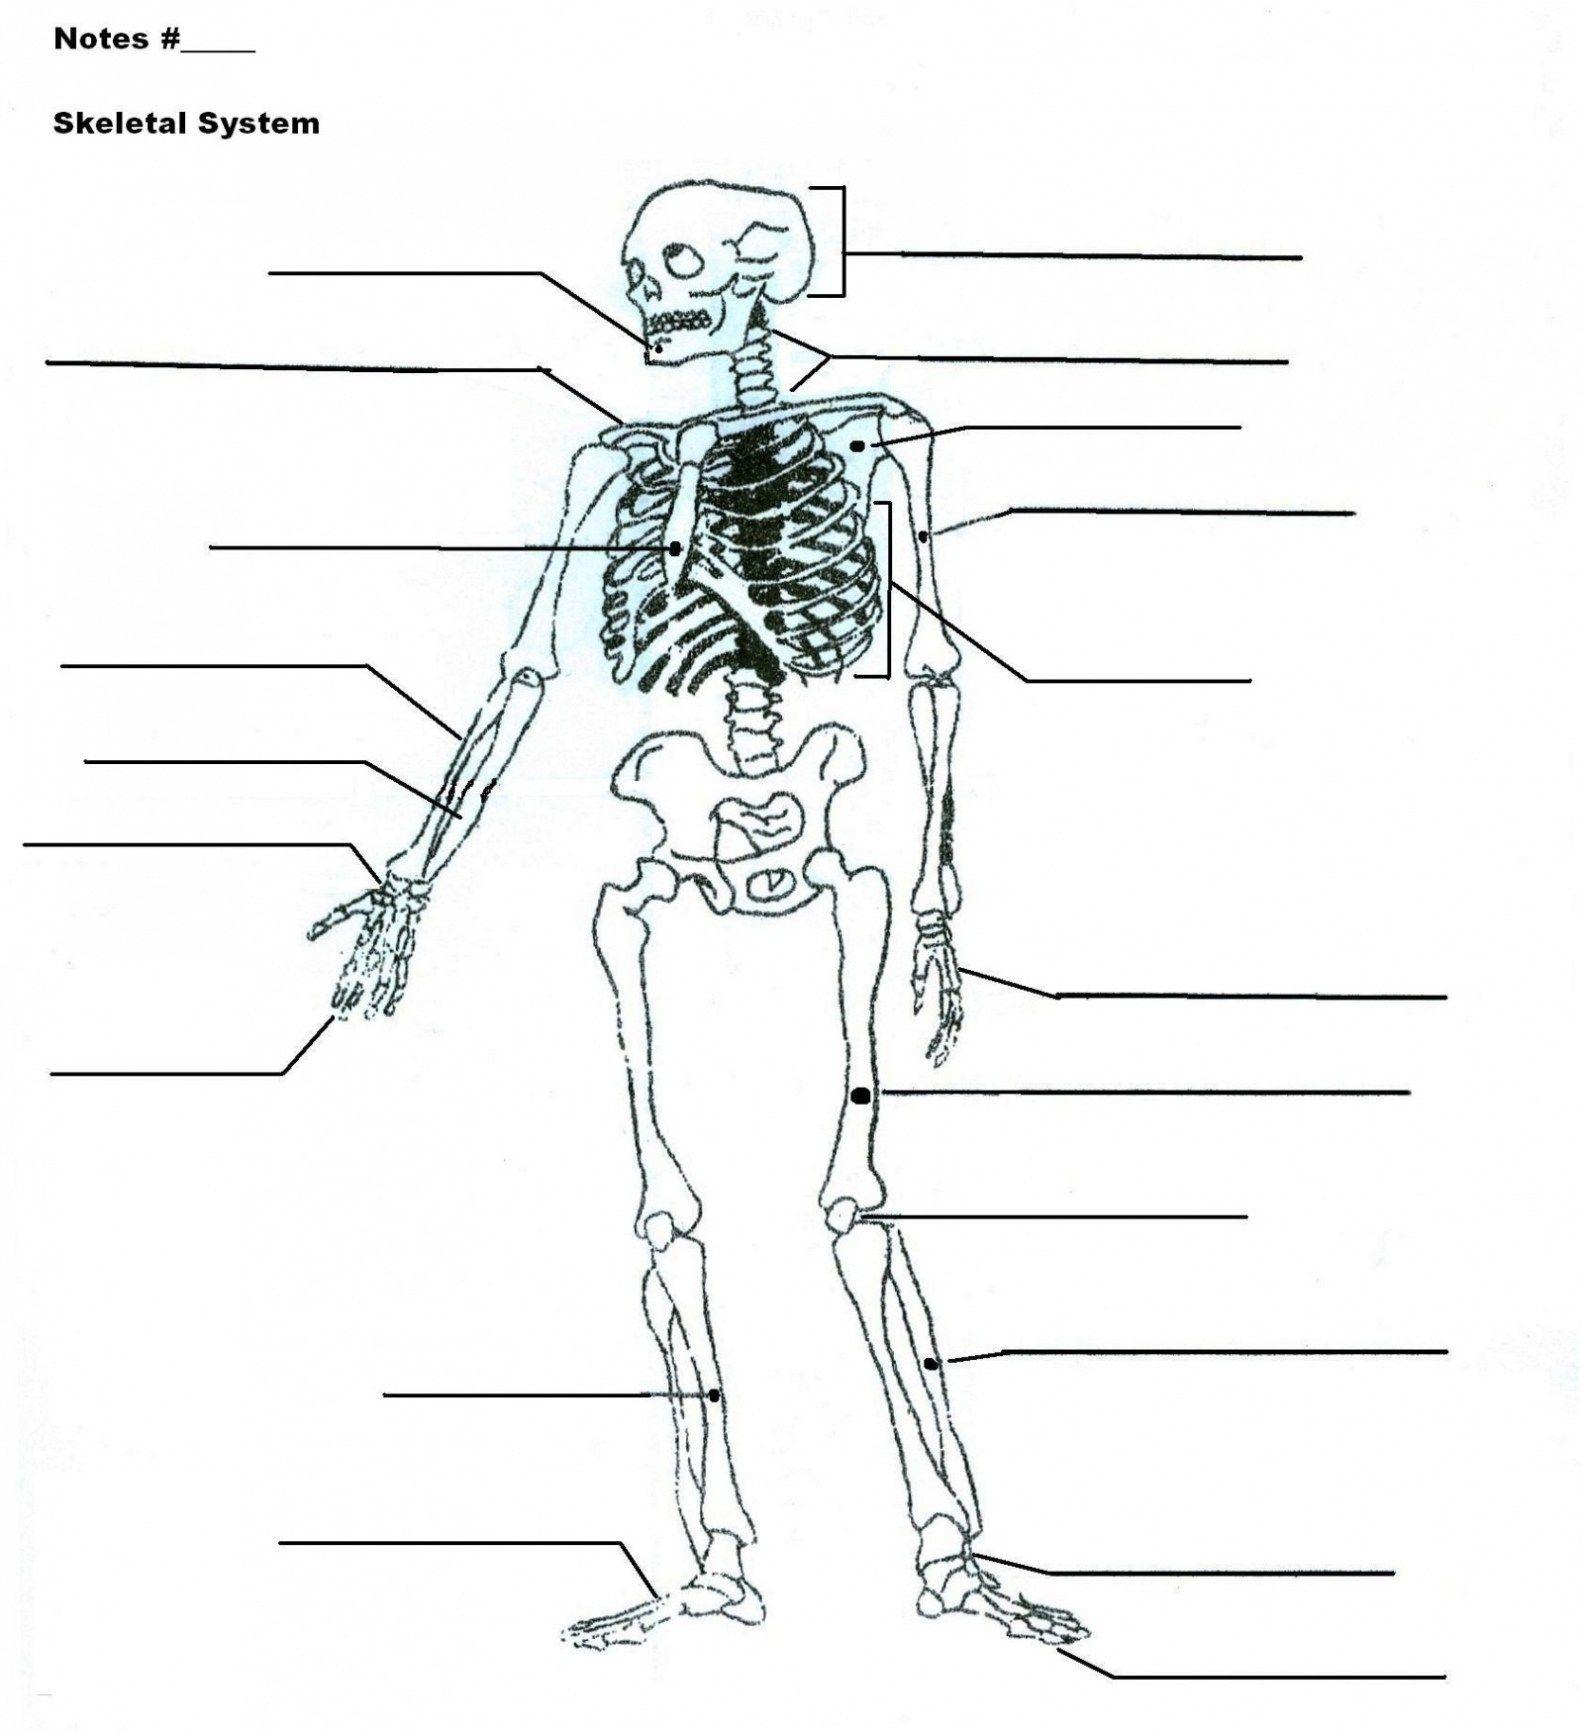 small resolution of human skeleton diagram unlabeled human skeleton diagram unlabeled unlabeled skull diagram daytonva150